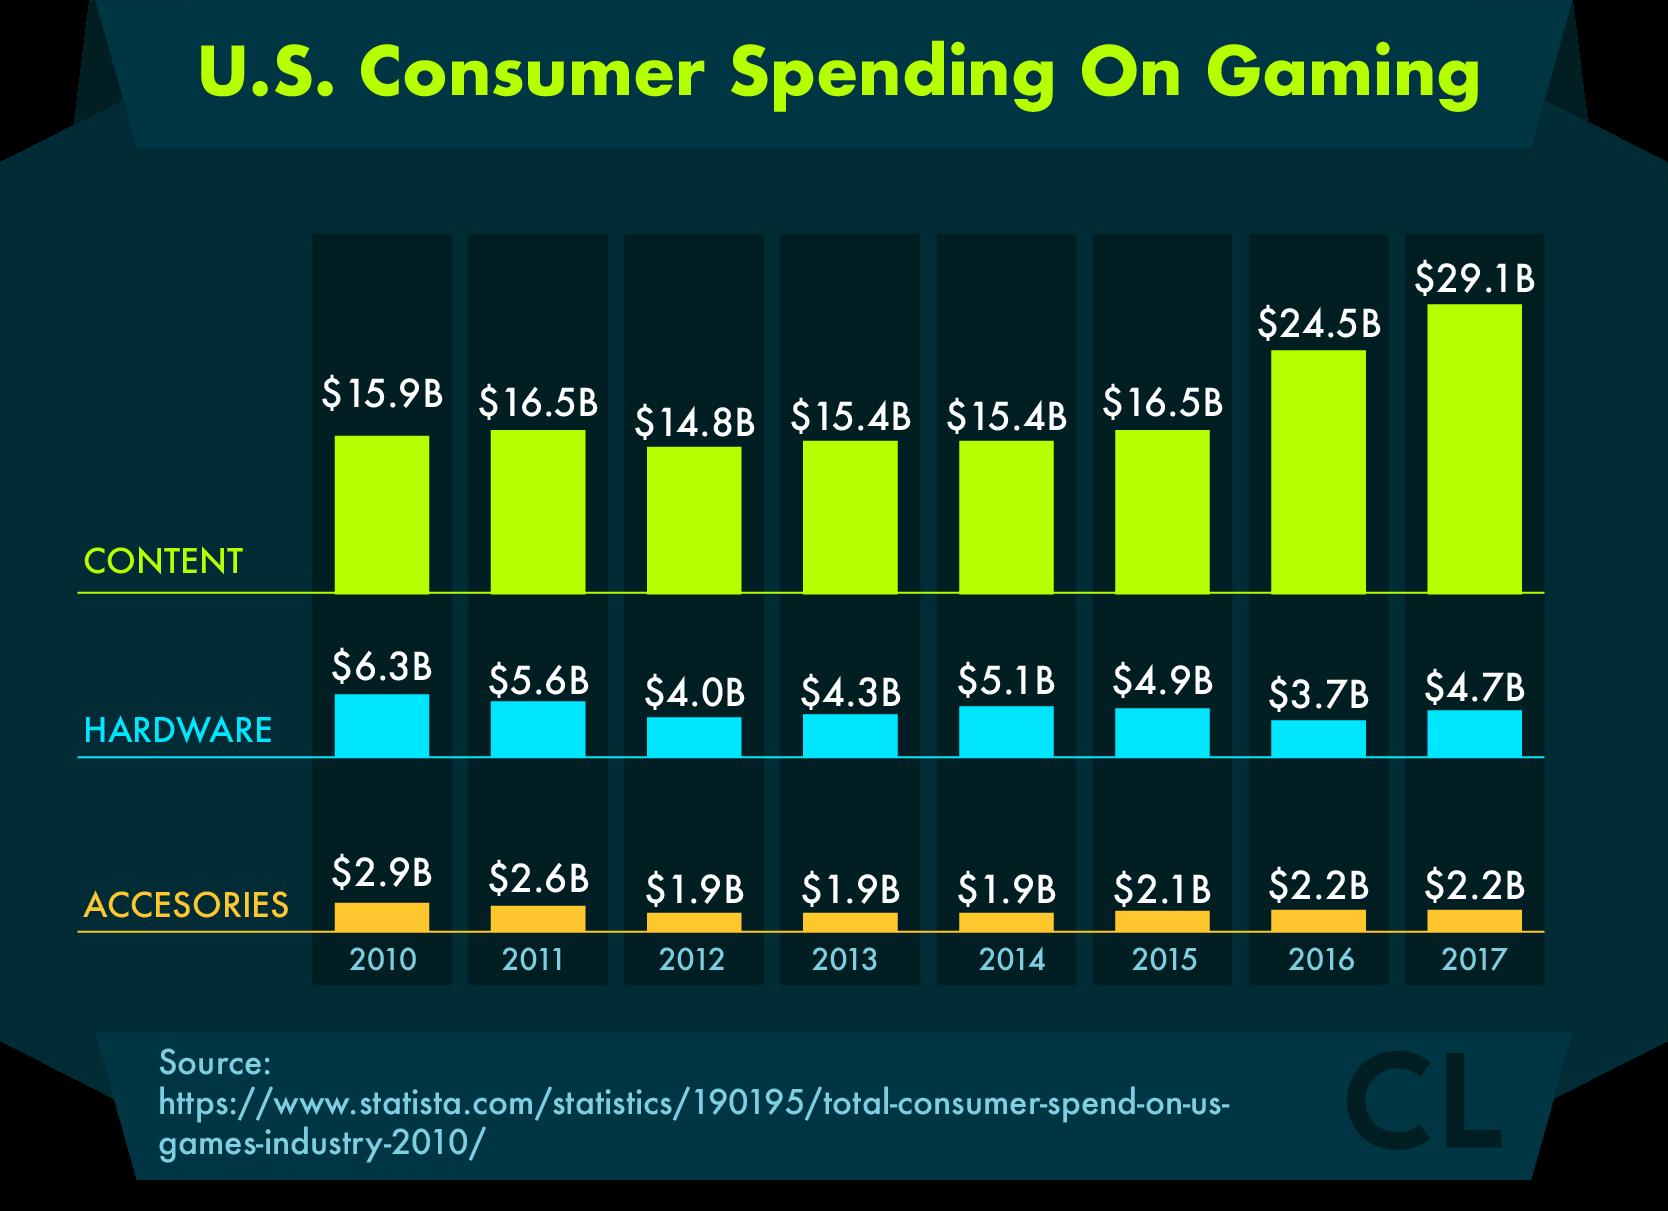 U.S. Consumer Spending On Gaming 2010-2017